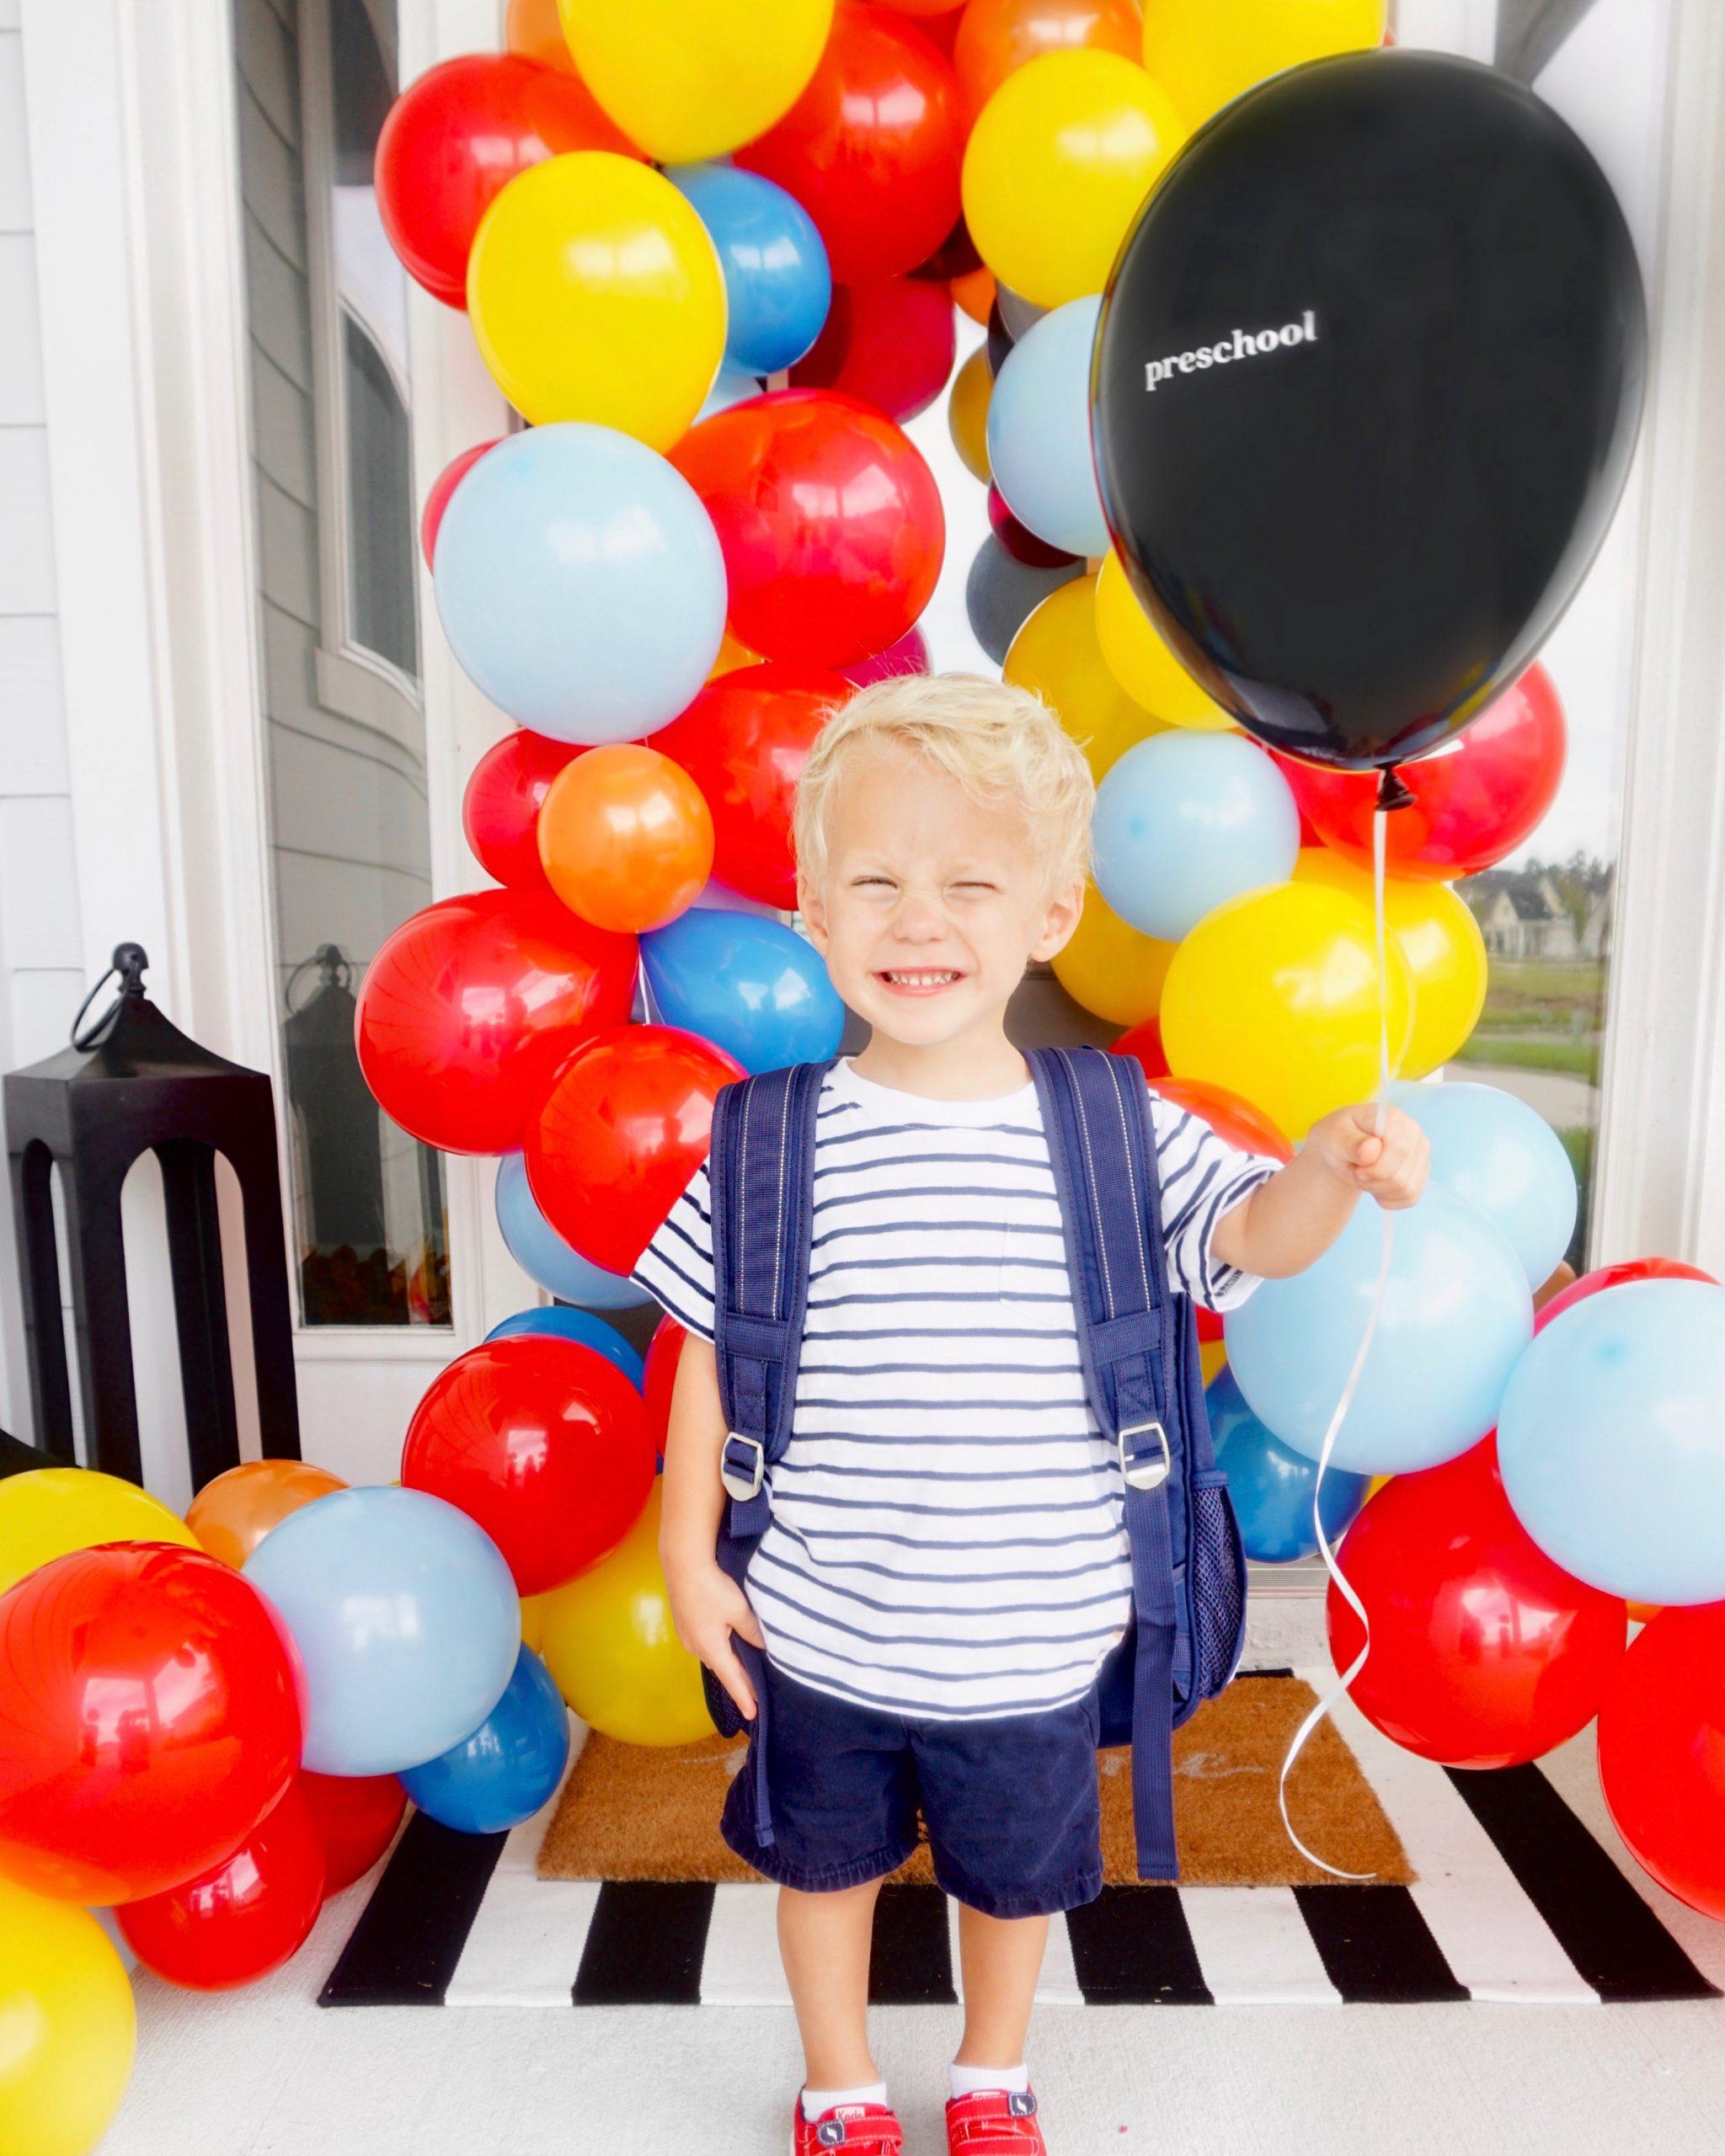 DIY- Balloon Garland in 4 Simple Steps